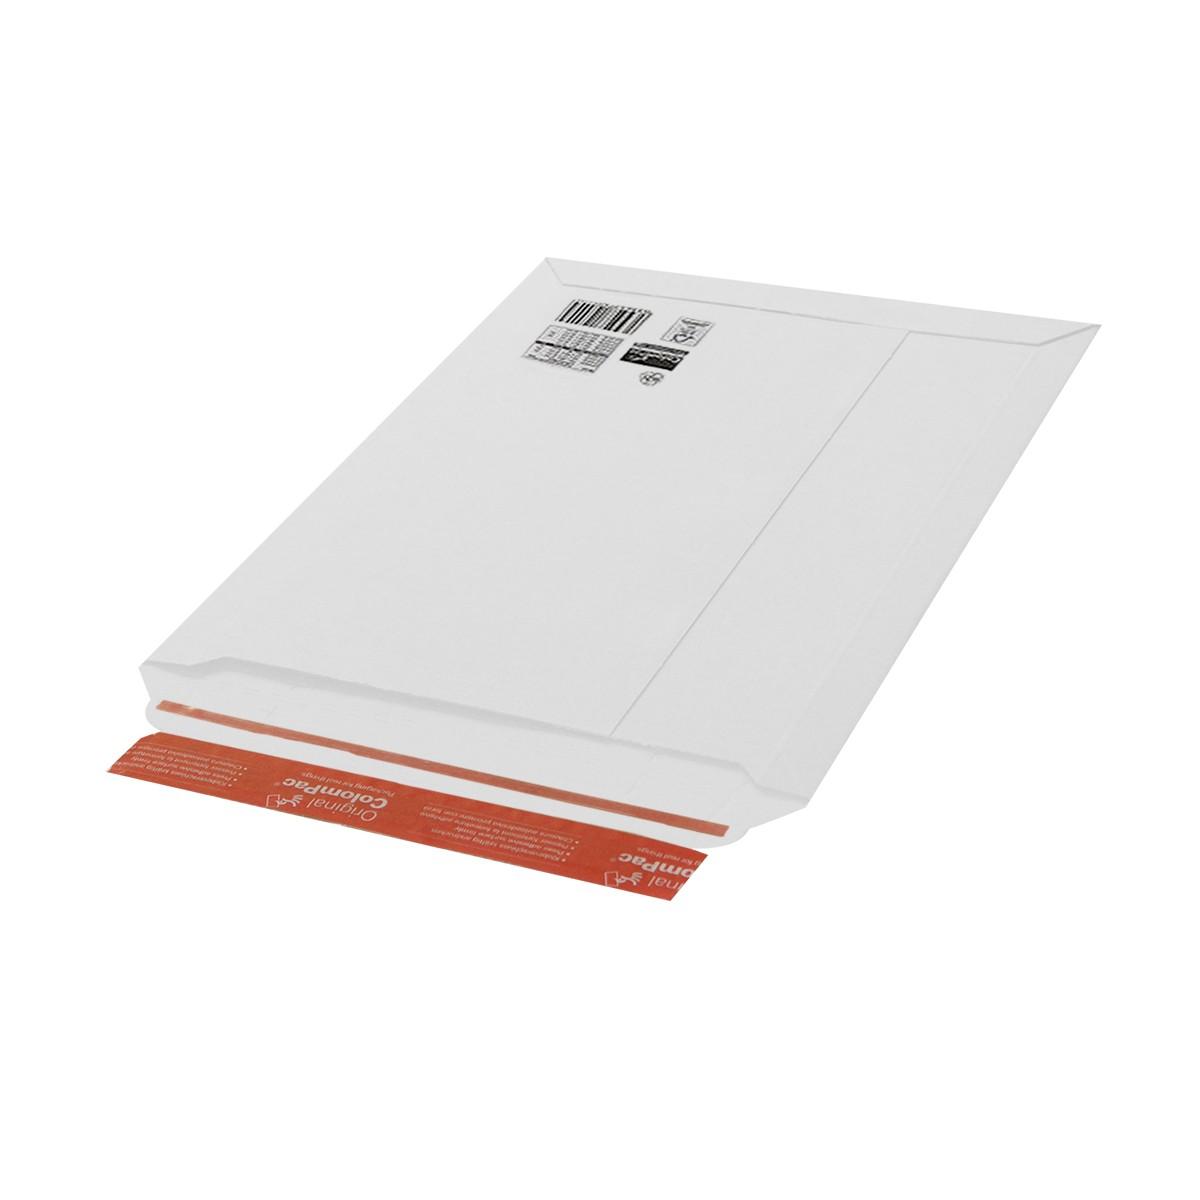 Einzelverpackung Wellpapp-Verpackung 313 x 250 x 19 mm weiß